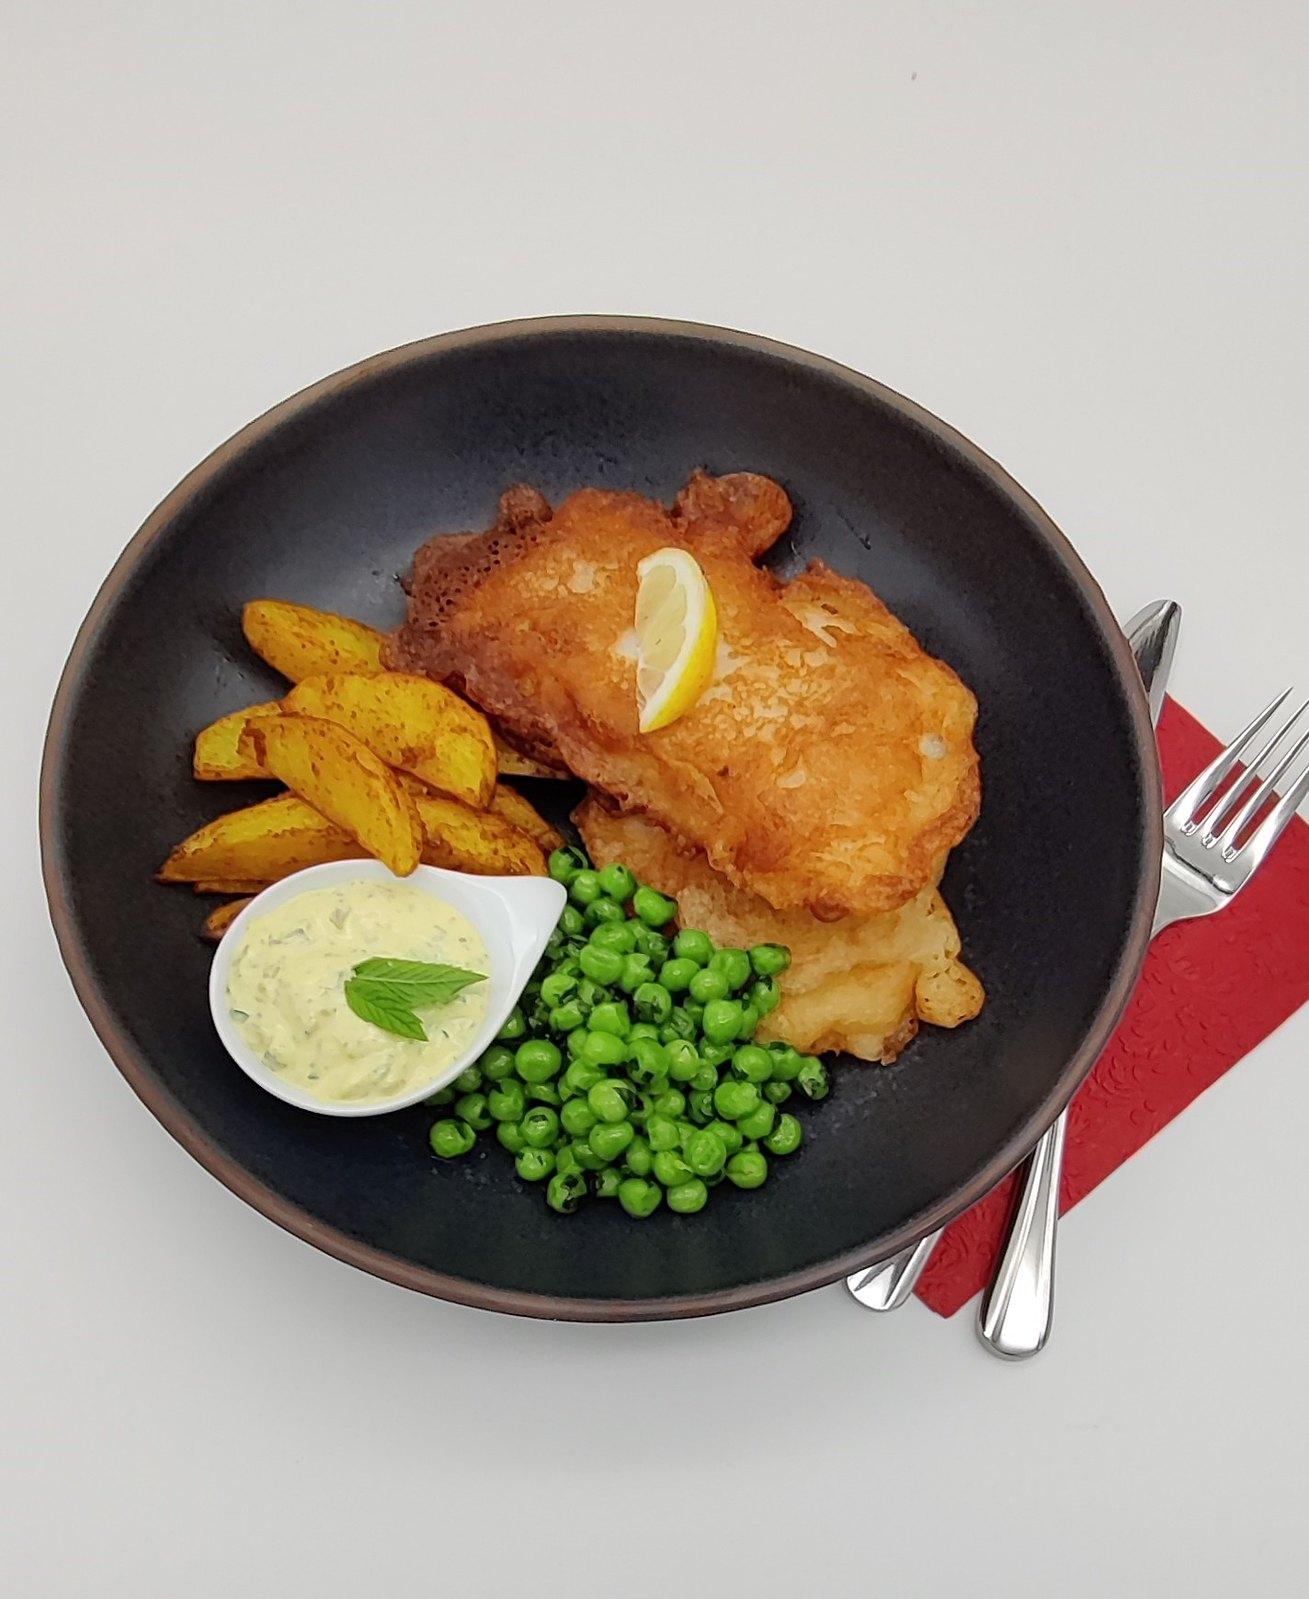 Fish 'n' chips 🇬🇧